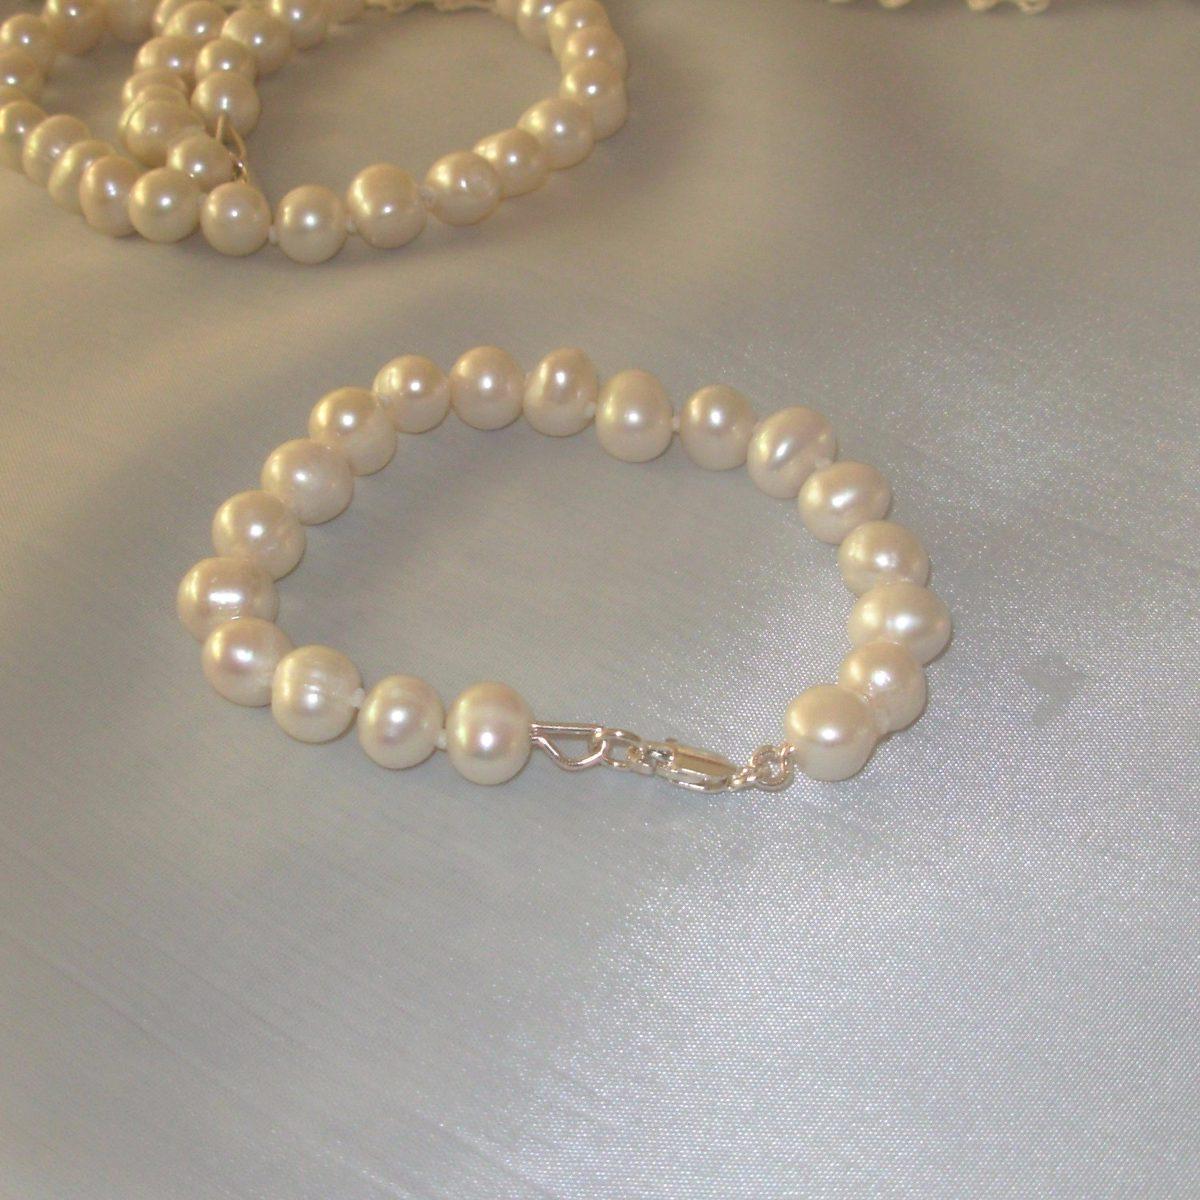 9a96ecc2d257 conjunto de perlas naturales cultivadas plata aros pasantes. Cargando zoom.